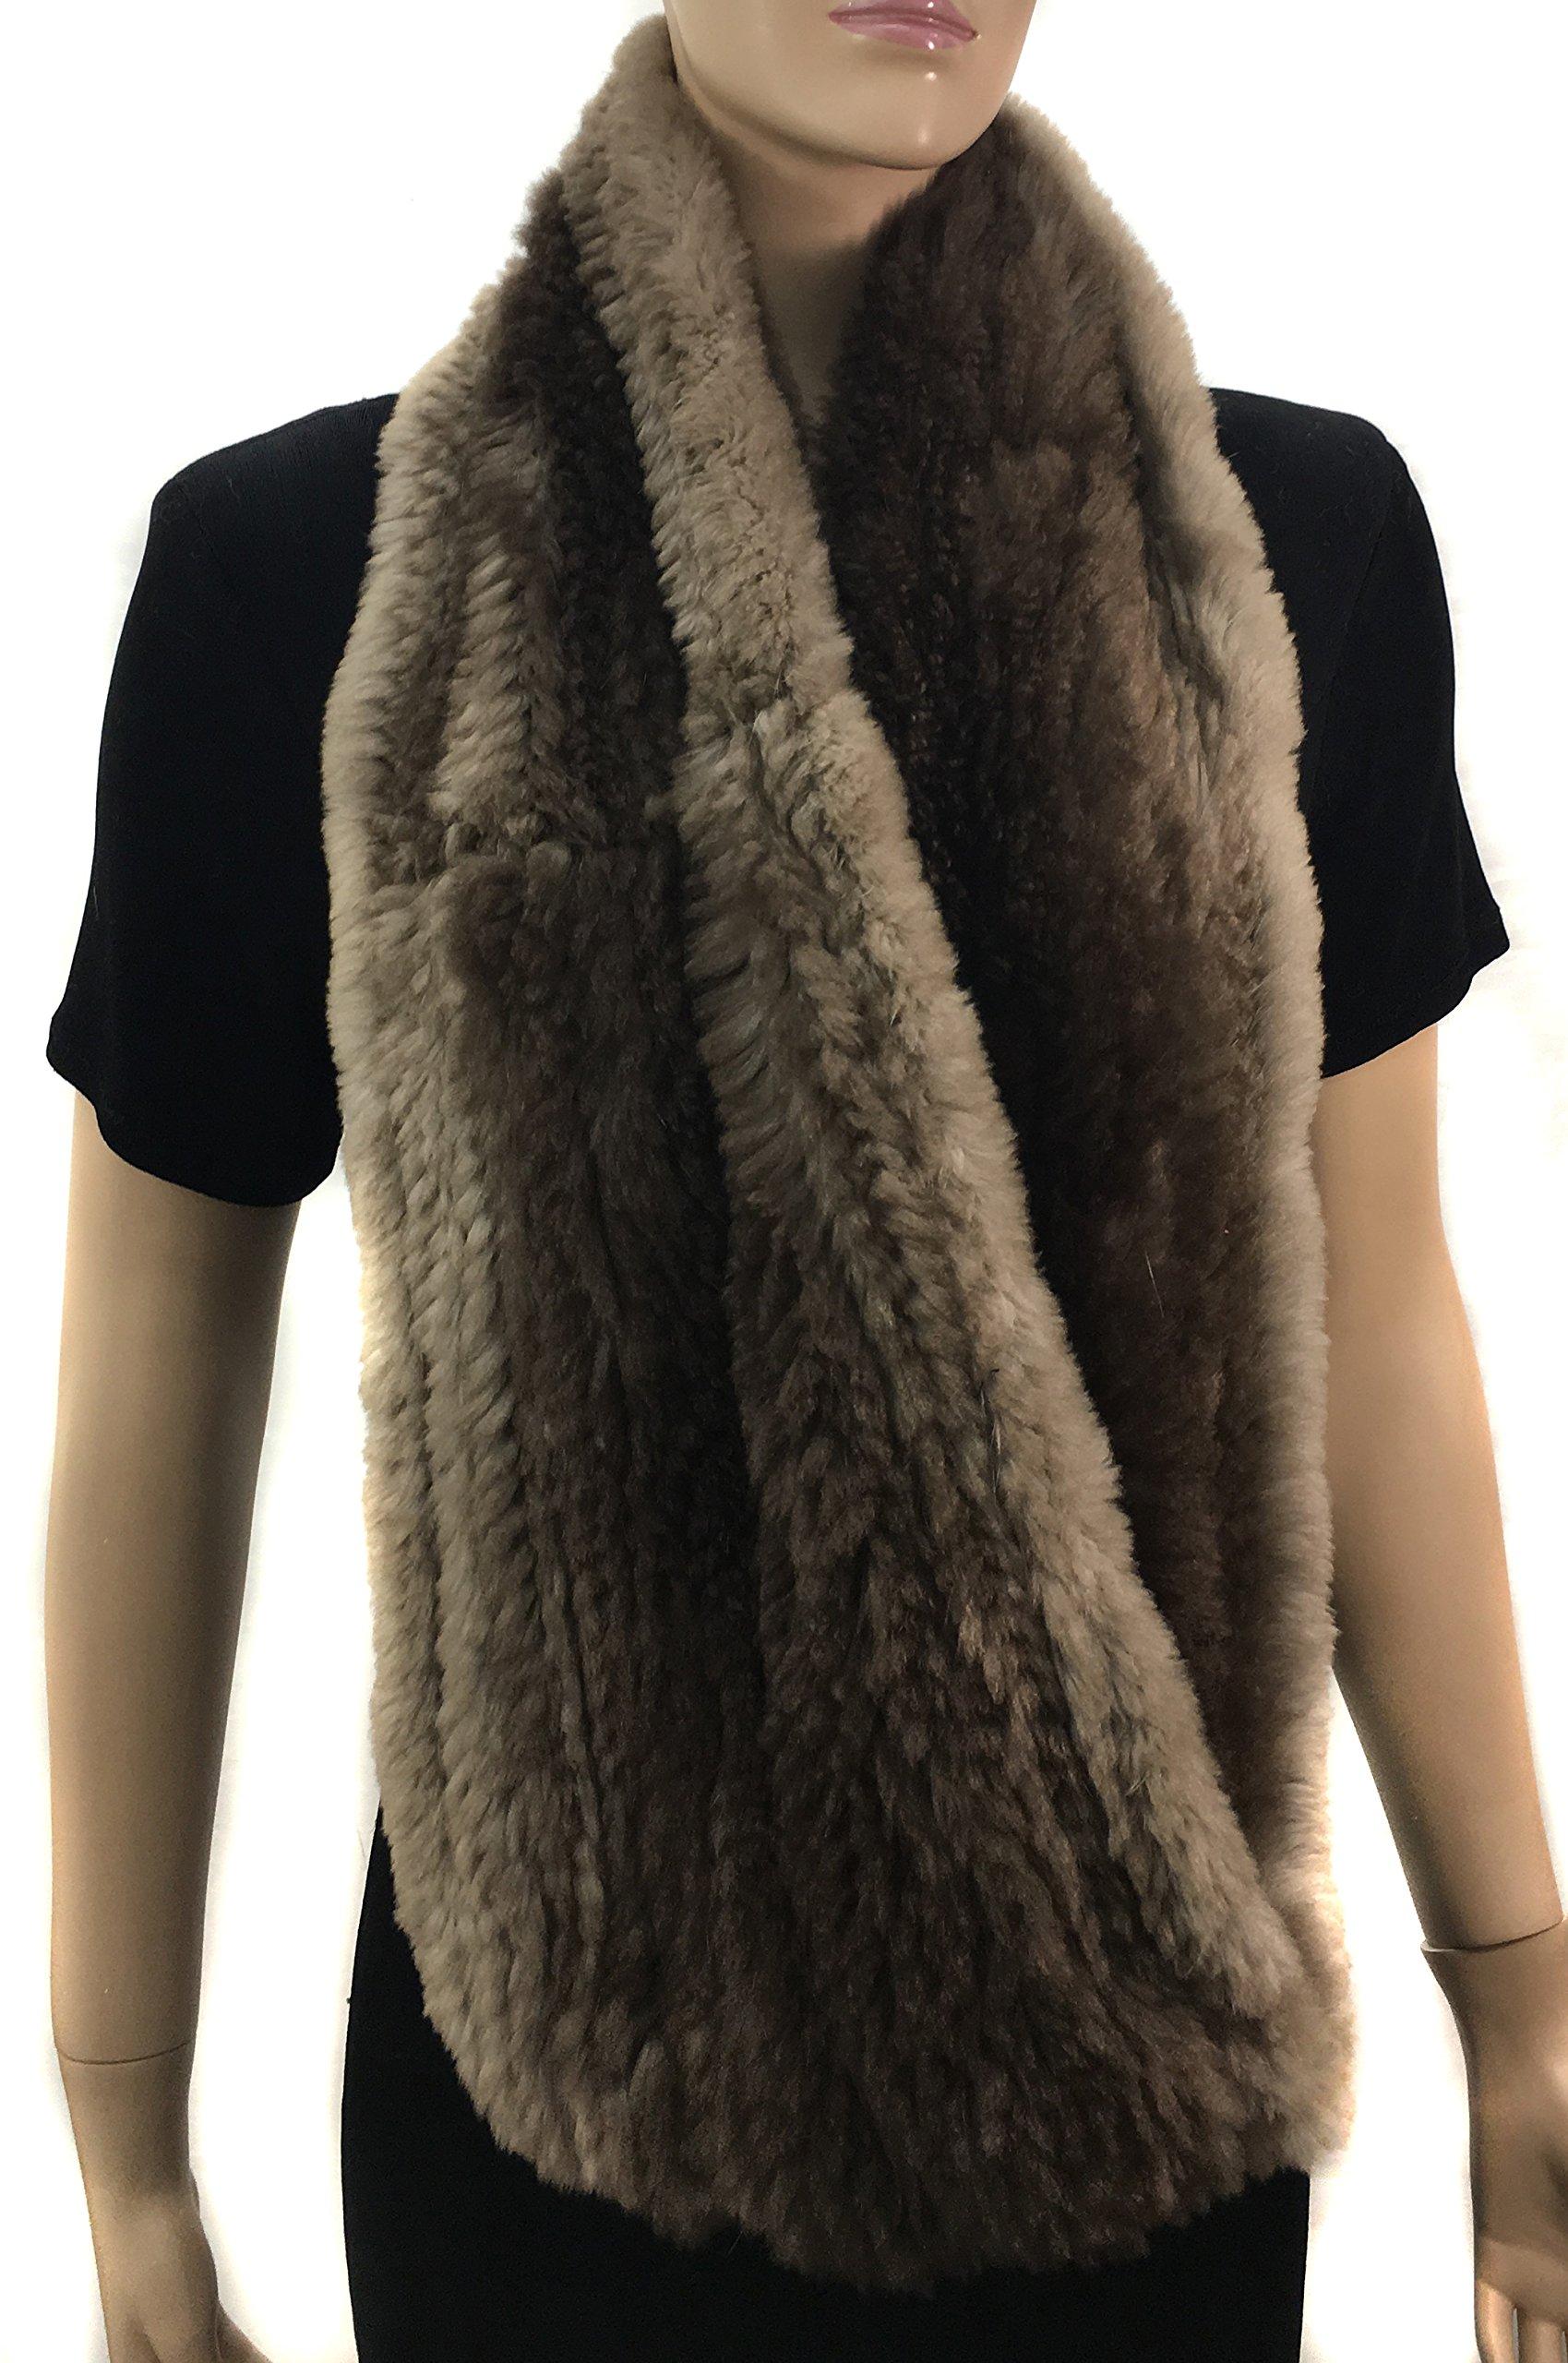 HIMA 100% Beaver Fur Infinity Scarf/Neck Warmer (Infinity Scarf) by Hima